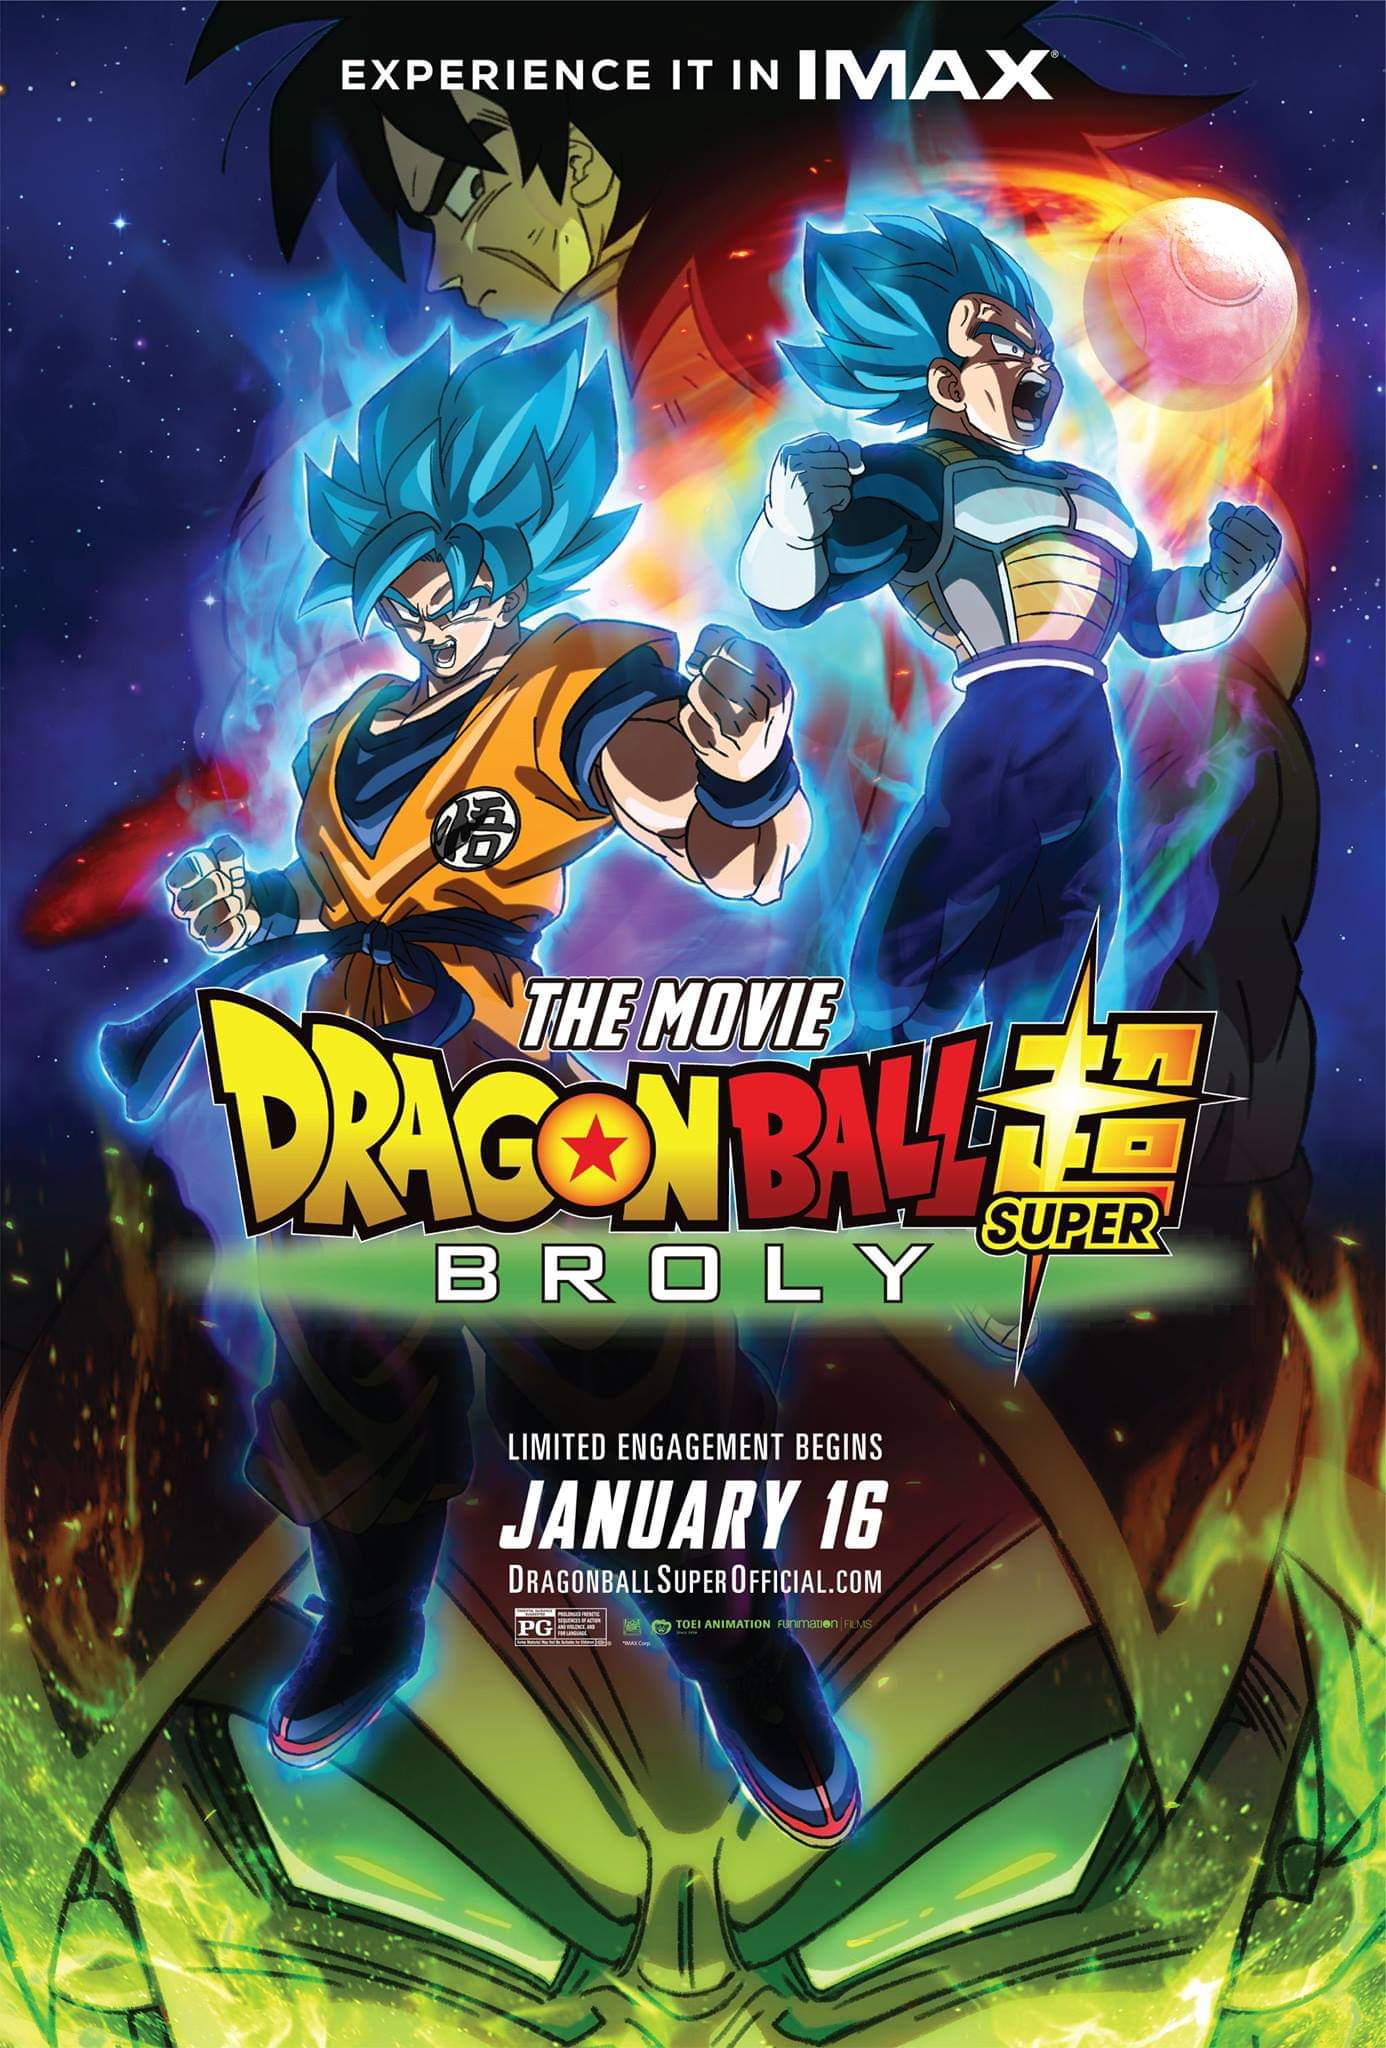 Dragon Ball Super: The Movie kapak